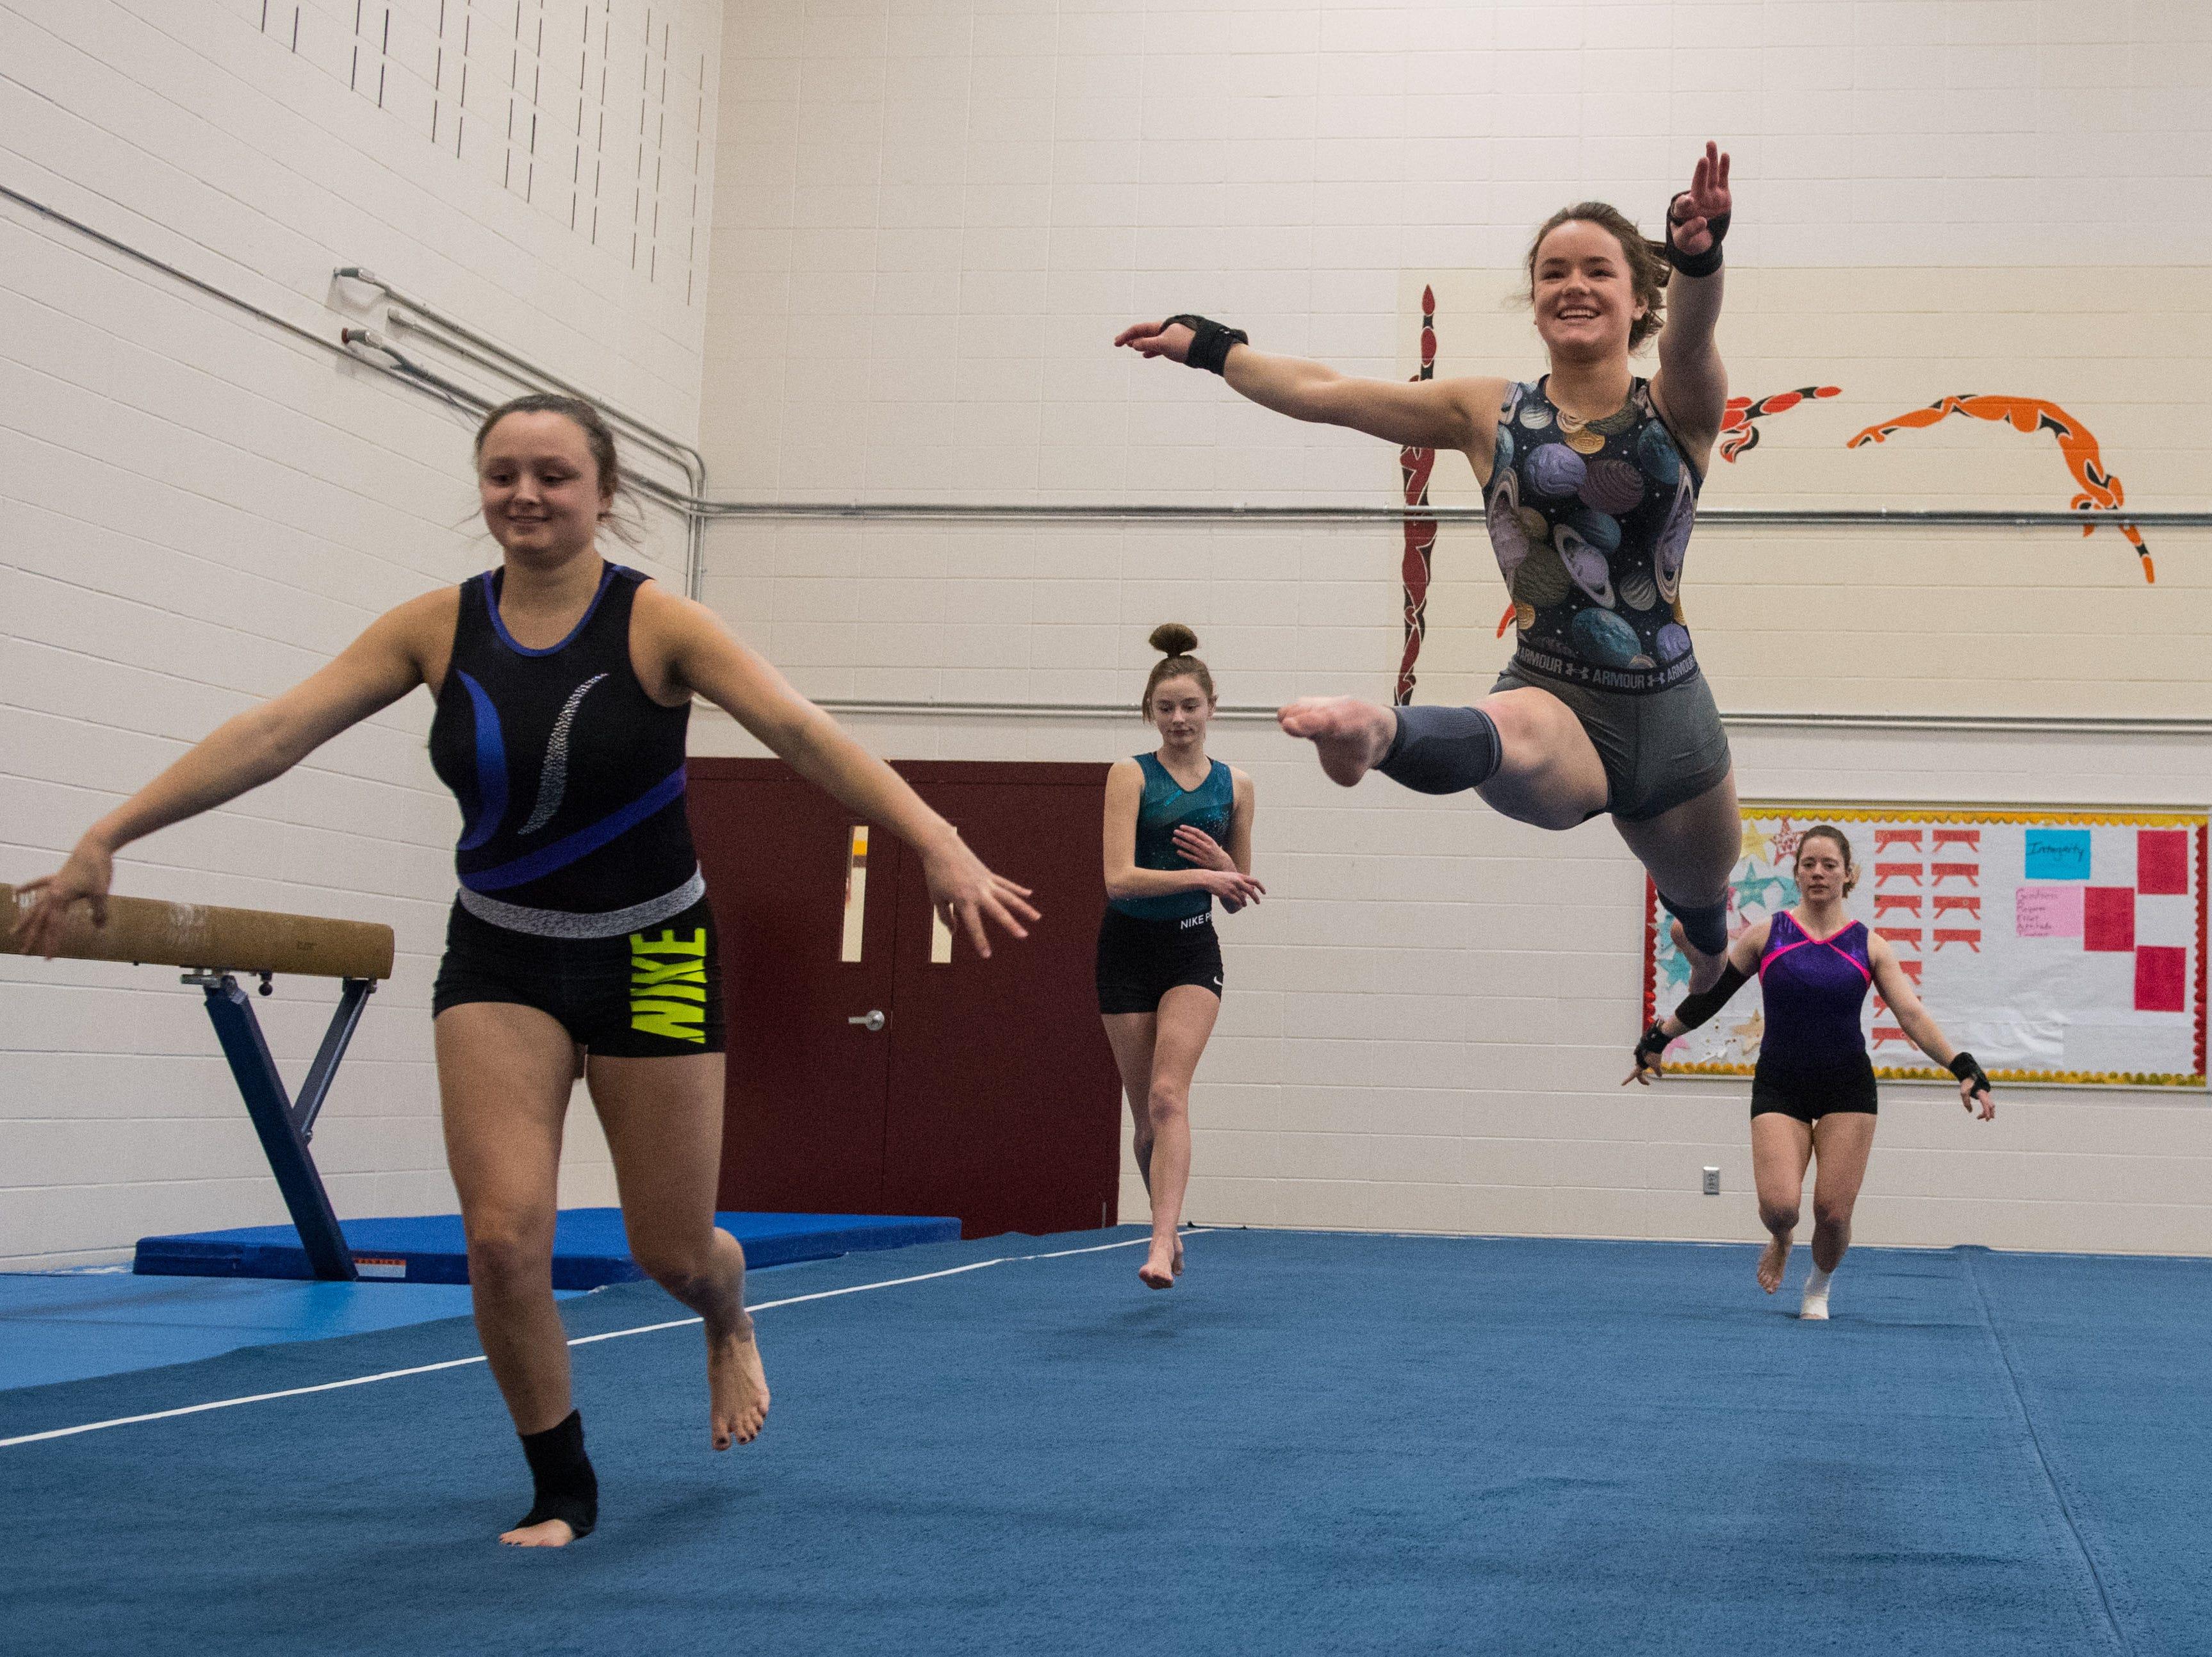 Roosevelt High School gymnast Jordyn Thoene practices her routine in Sioux Falls, S.D., Wednesday, Feb. 6, 2019.